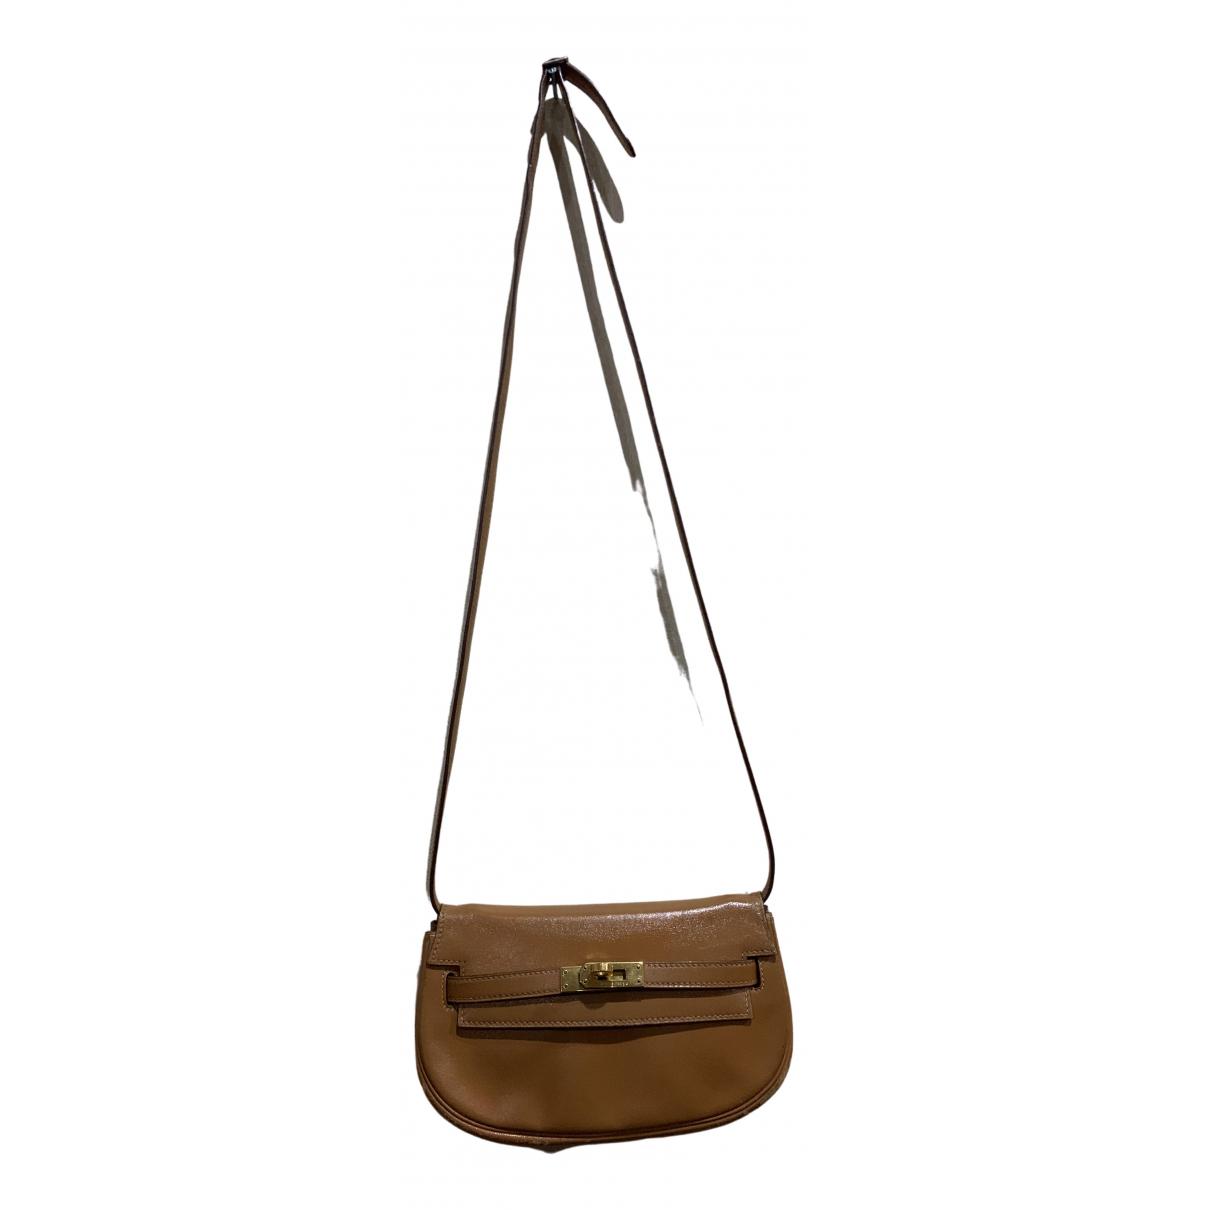 Hermès \N Camel Leather handbag for Women \N